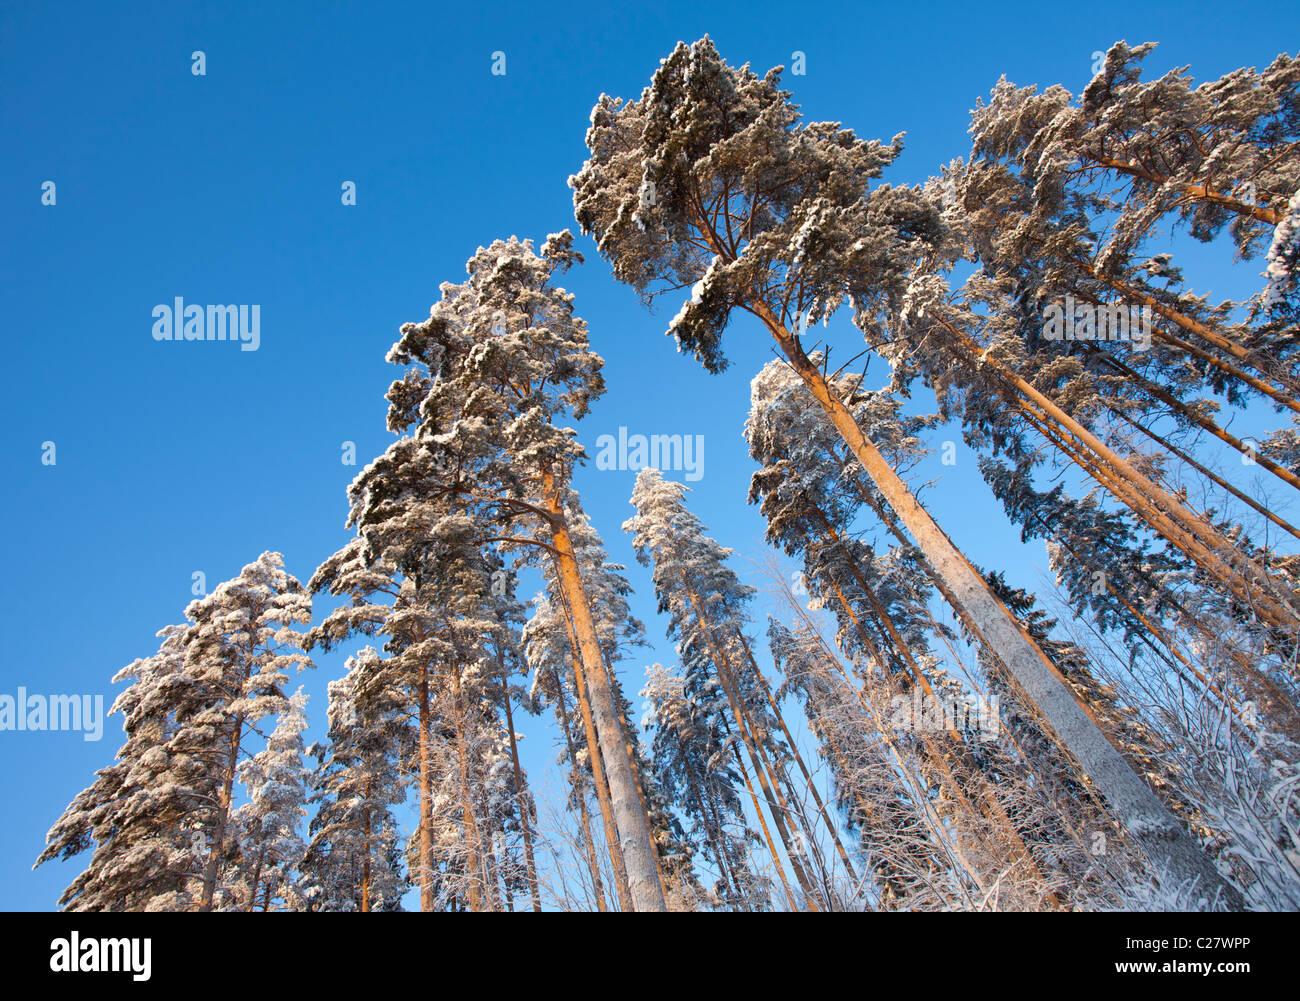 Finnische Kiefer (Pinus Sylvestris) Bäume im Winter, Finnland Stockbild